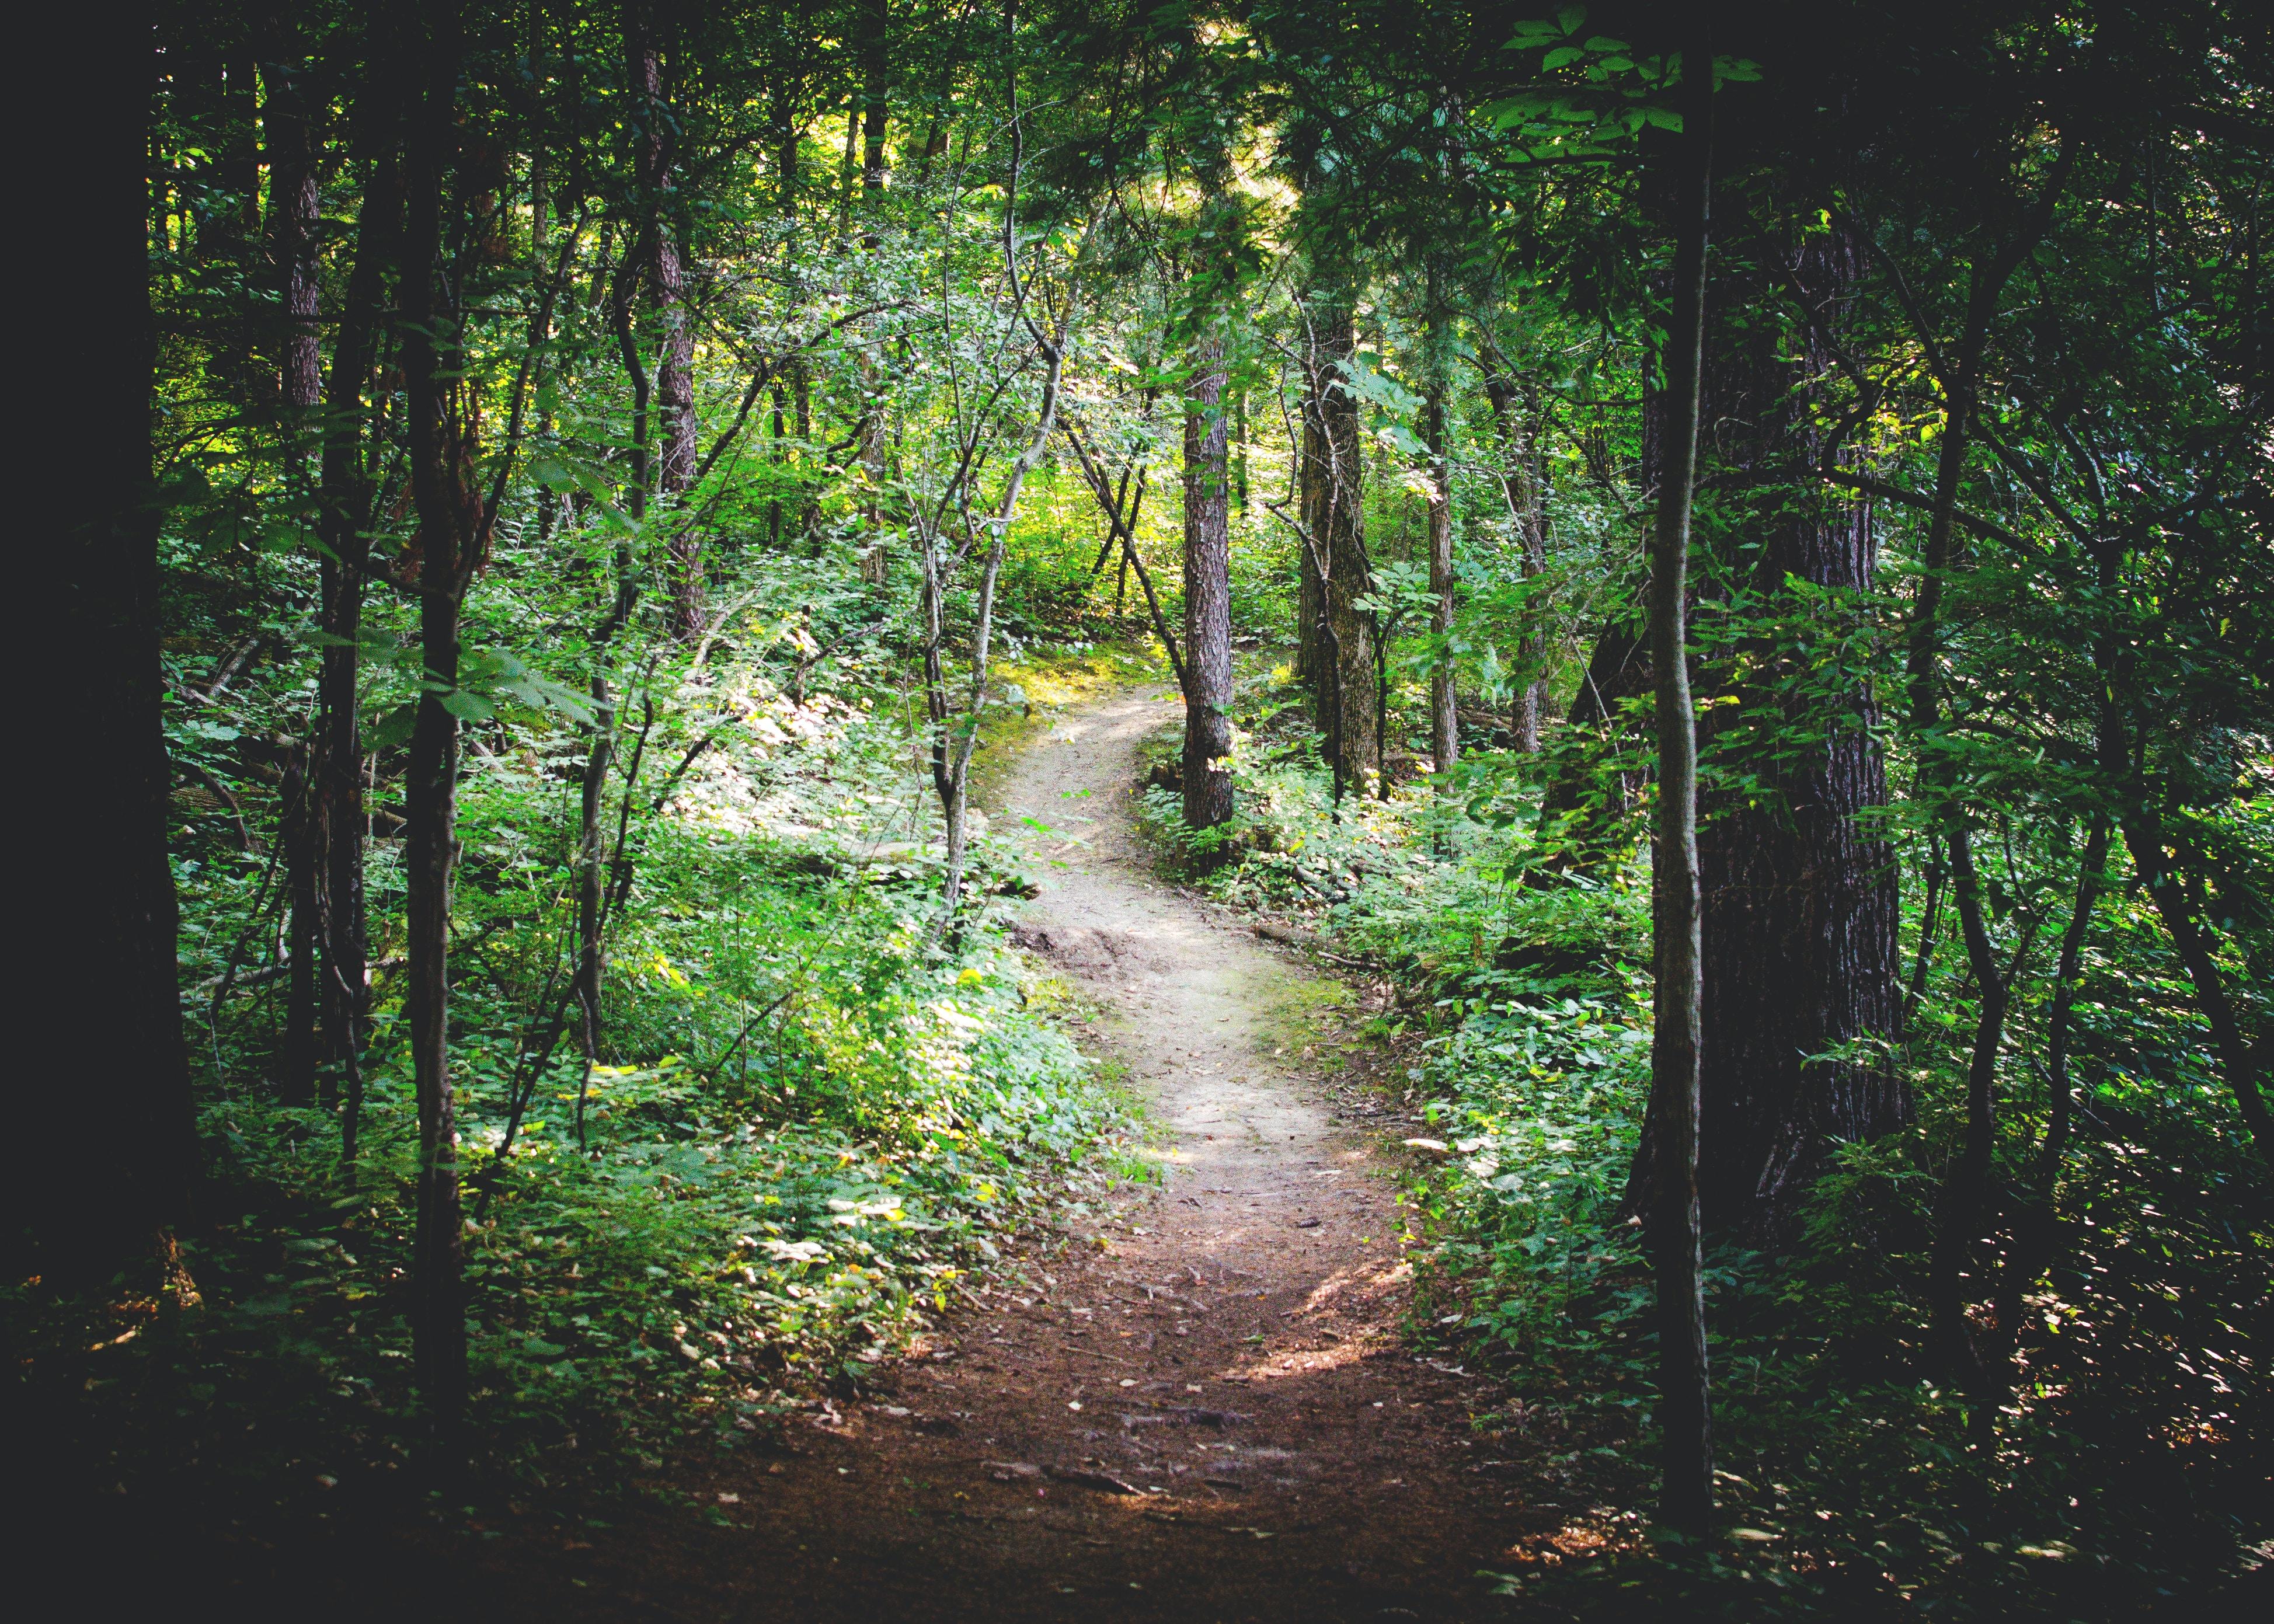 thin pathway between green trees